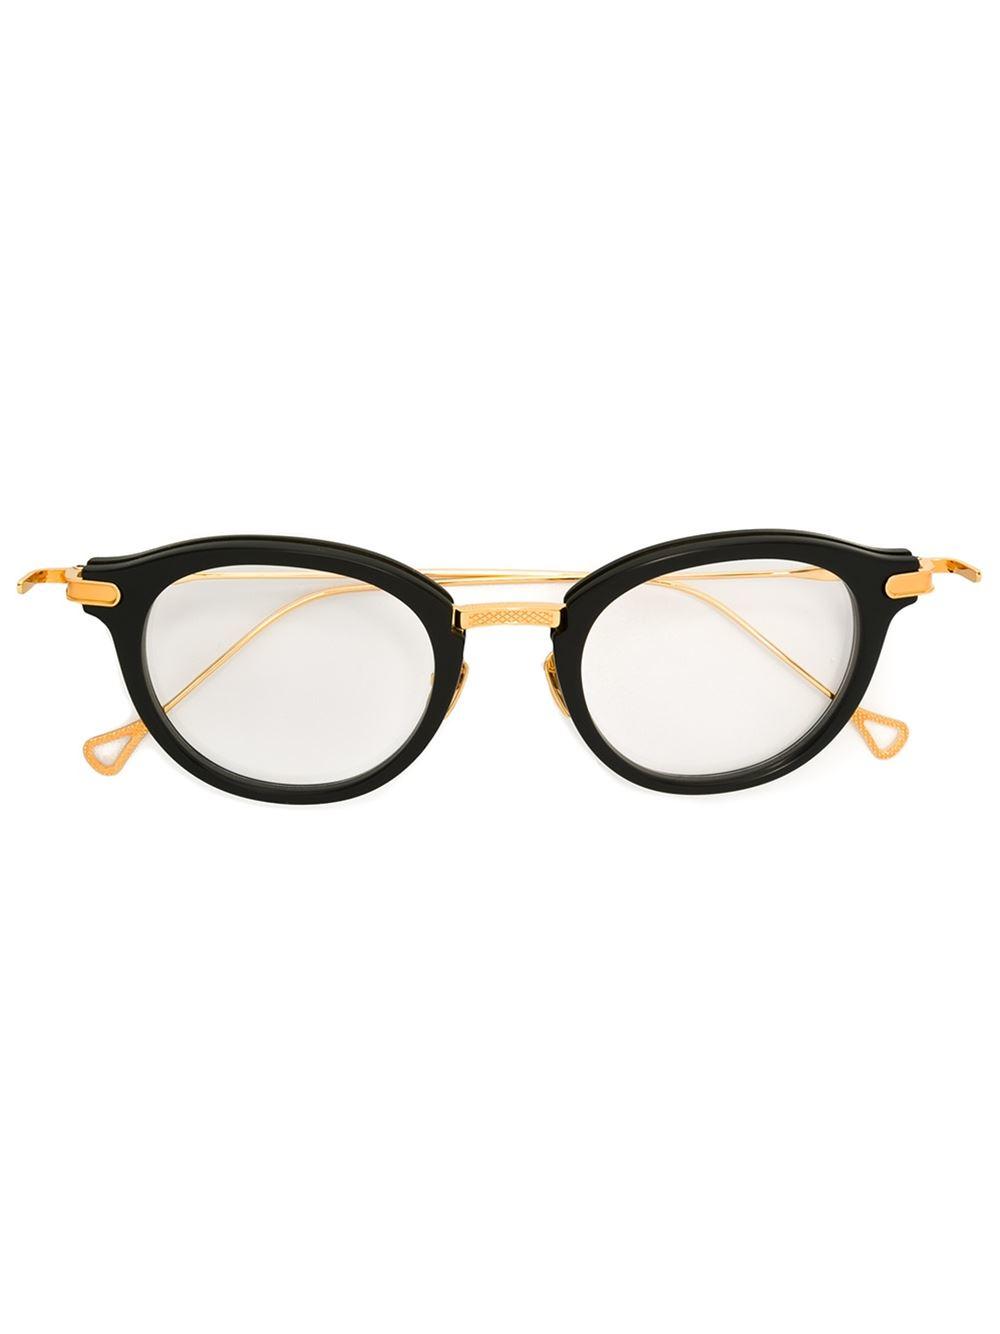 69964ef7cd6 Dita Eyeglasses Frames